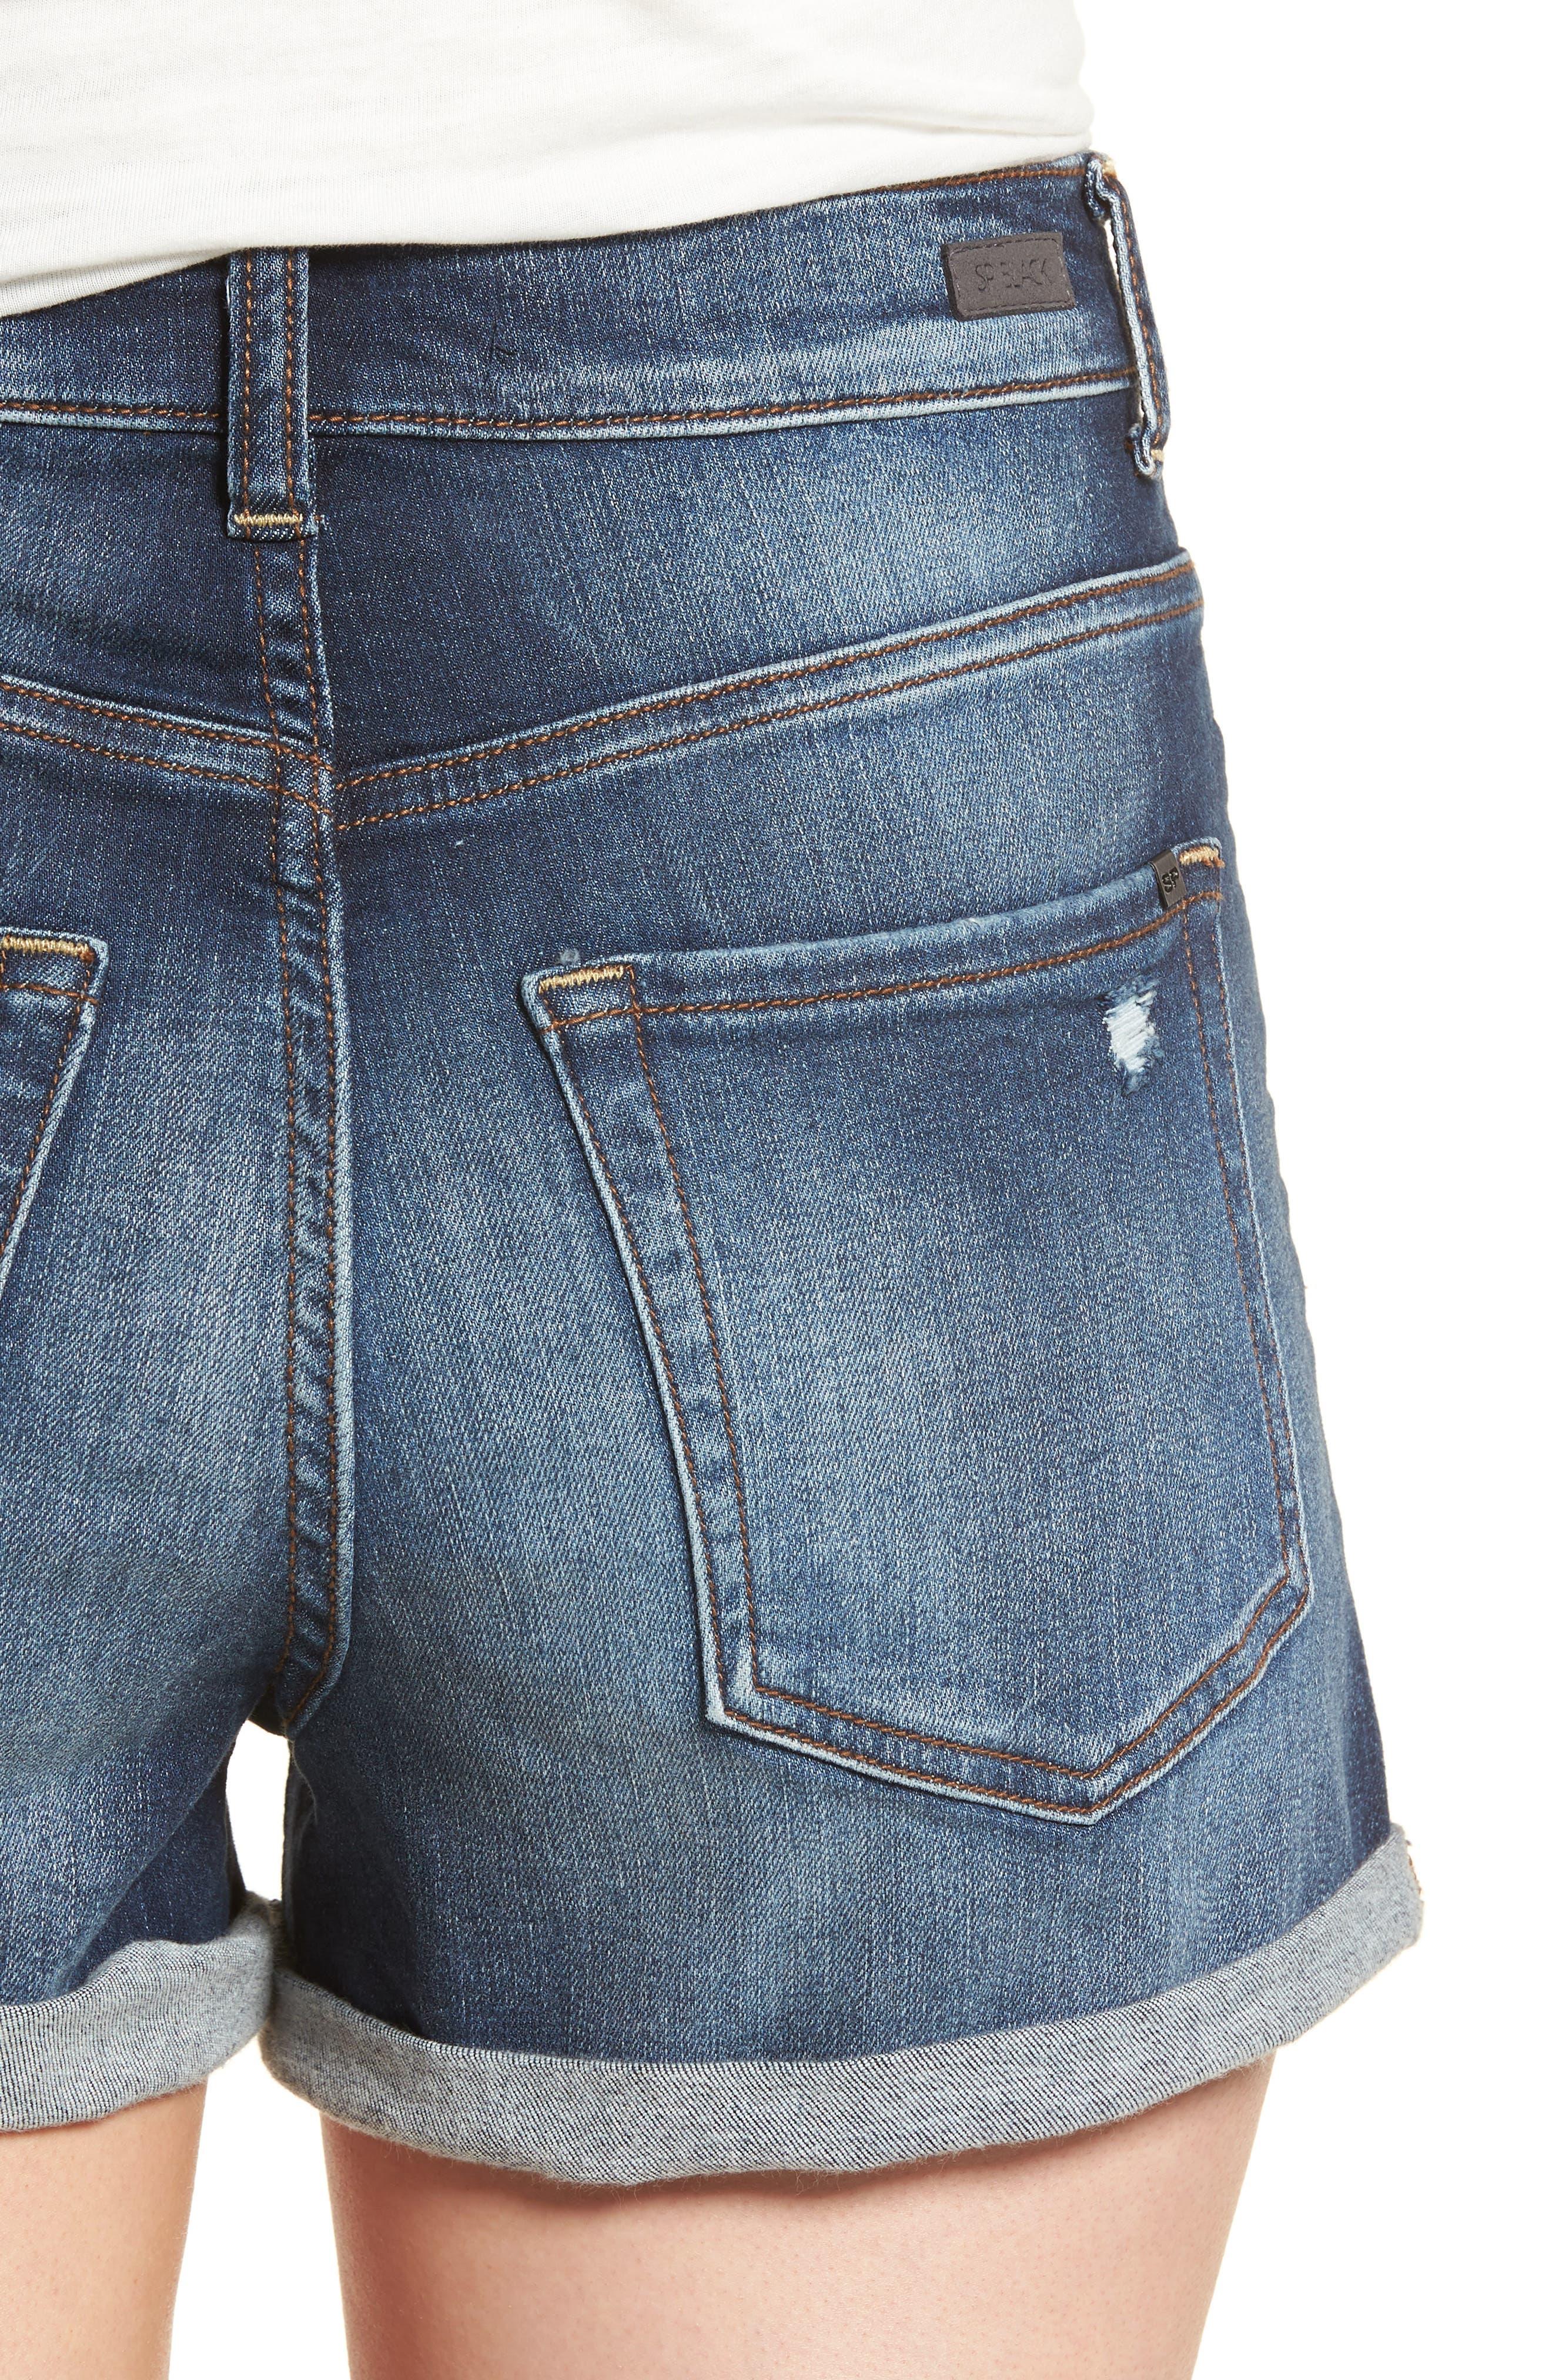 Cuffed High Waist Denim Shorts,                             Alternate thumbnail 4, color,                             401